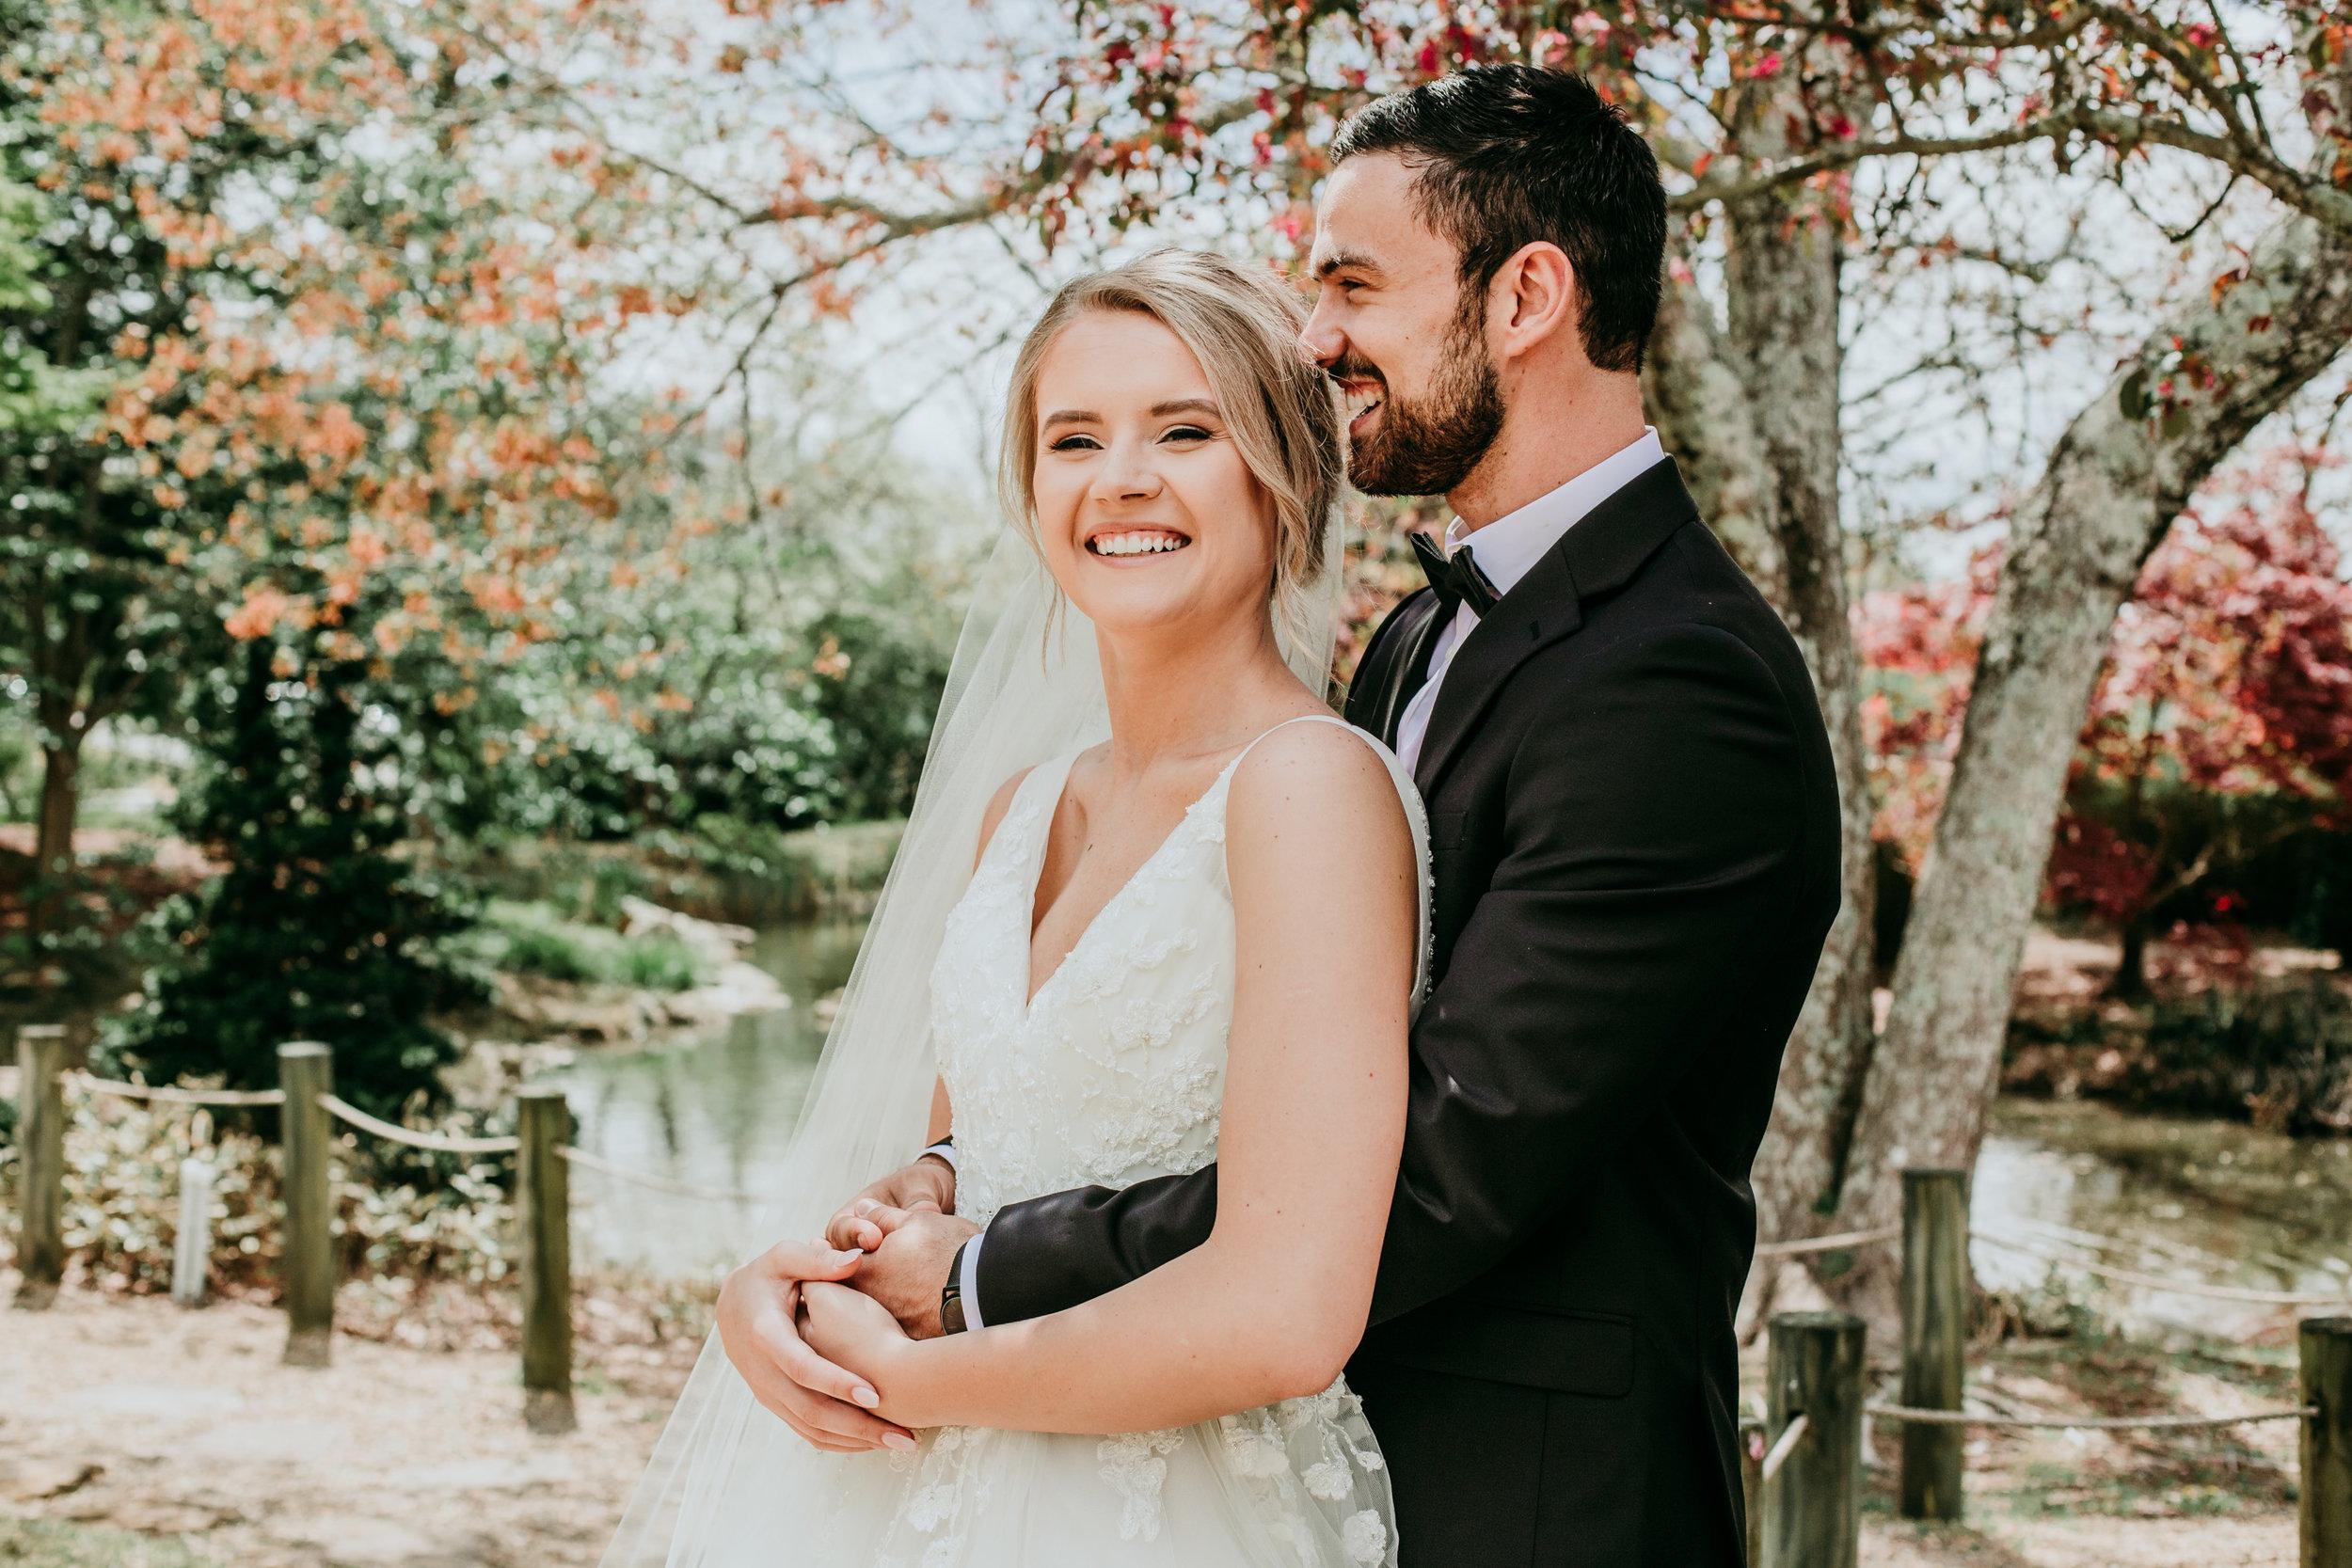 unique-wedding-locations-sc.jpg